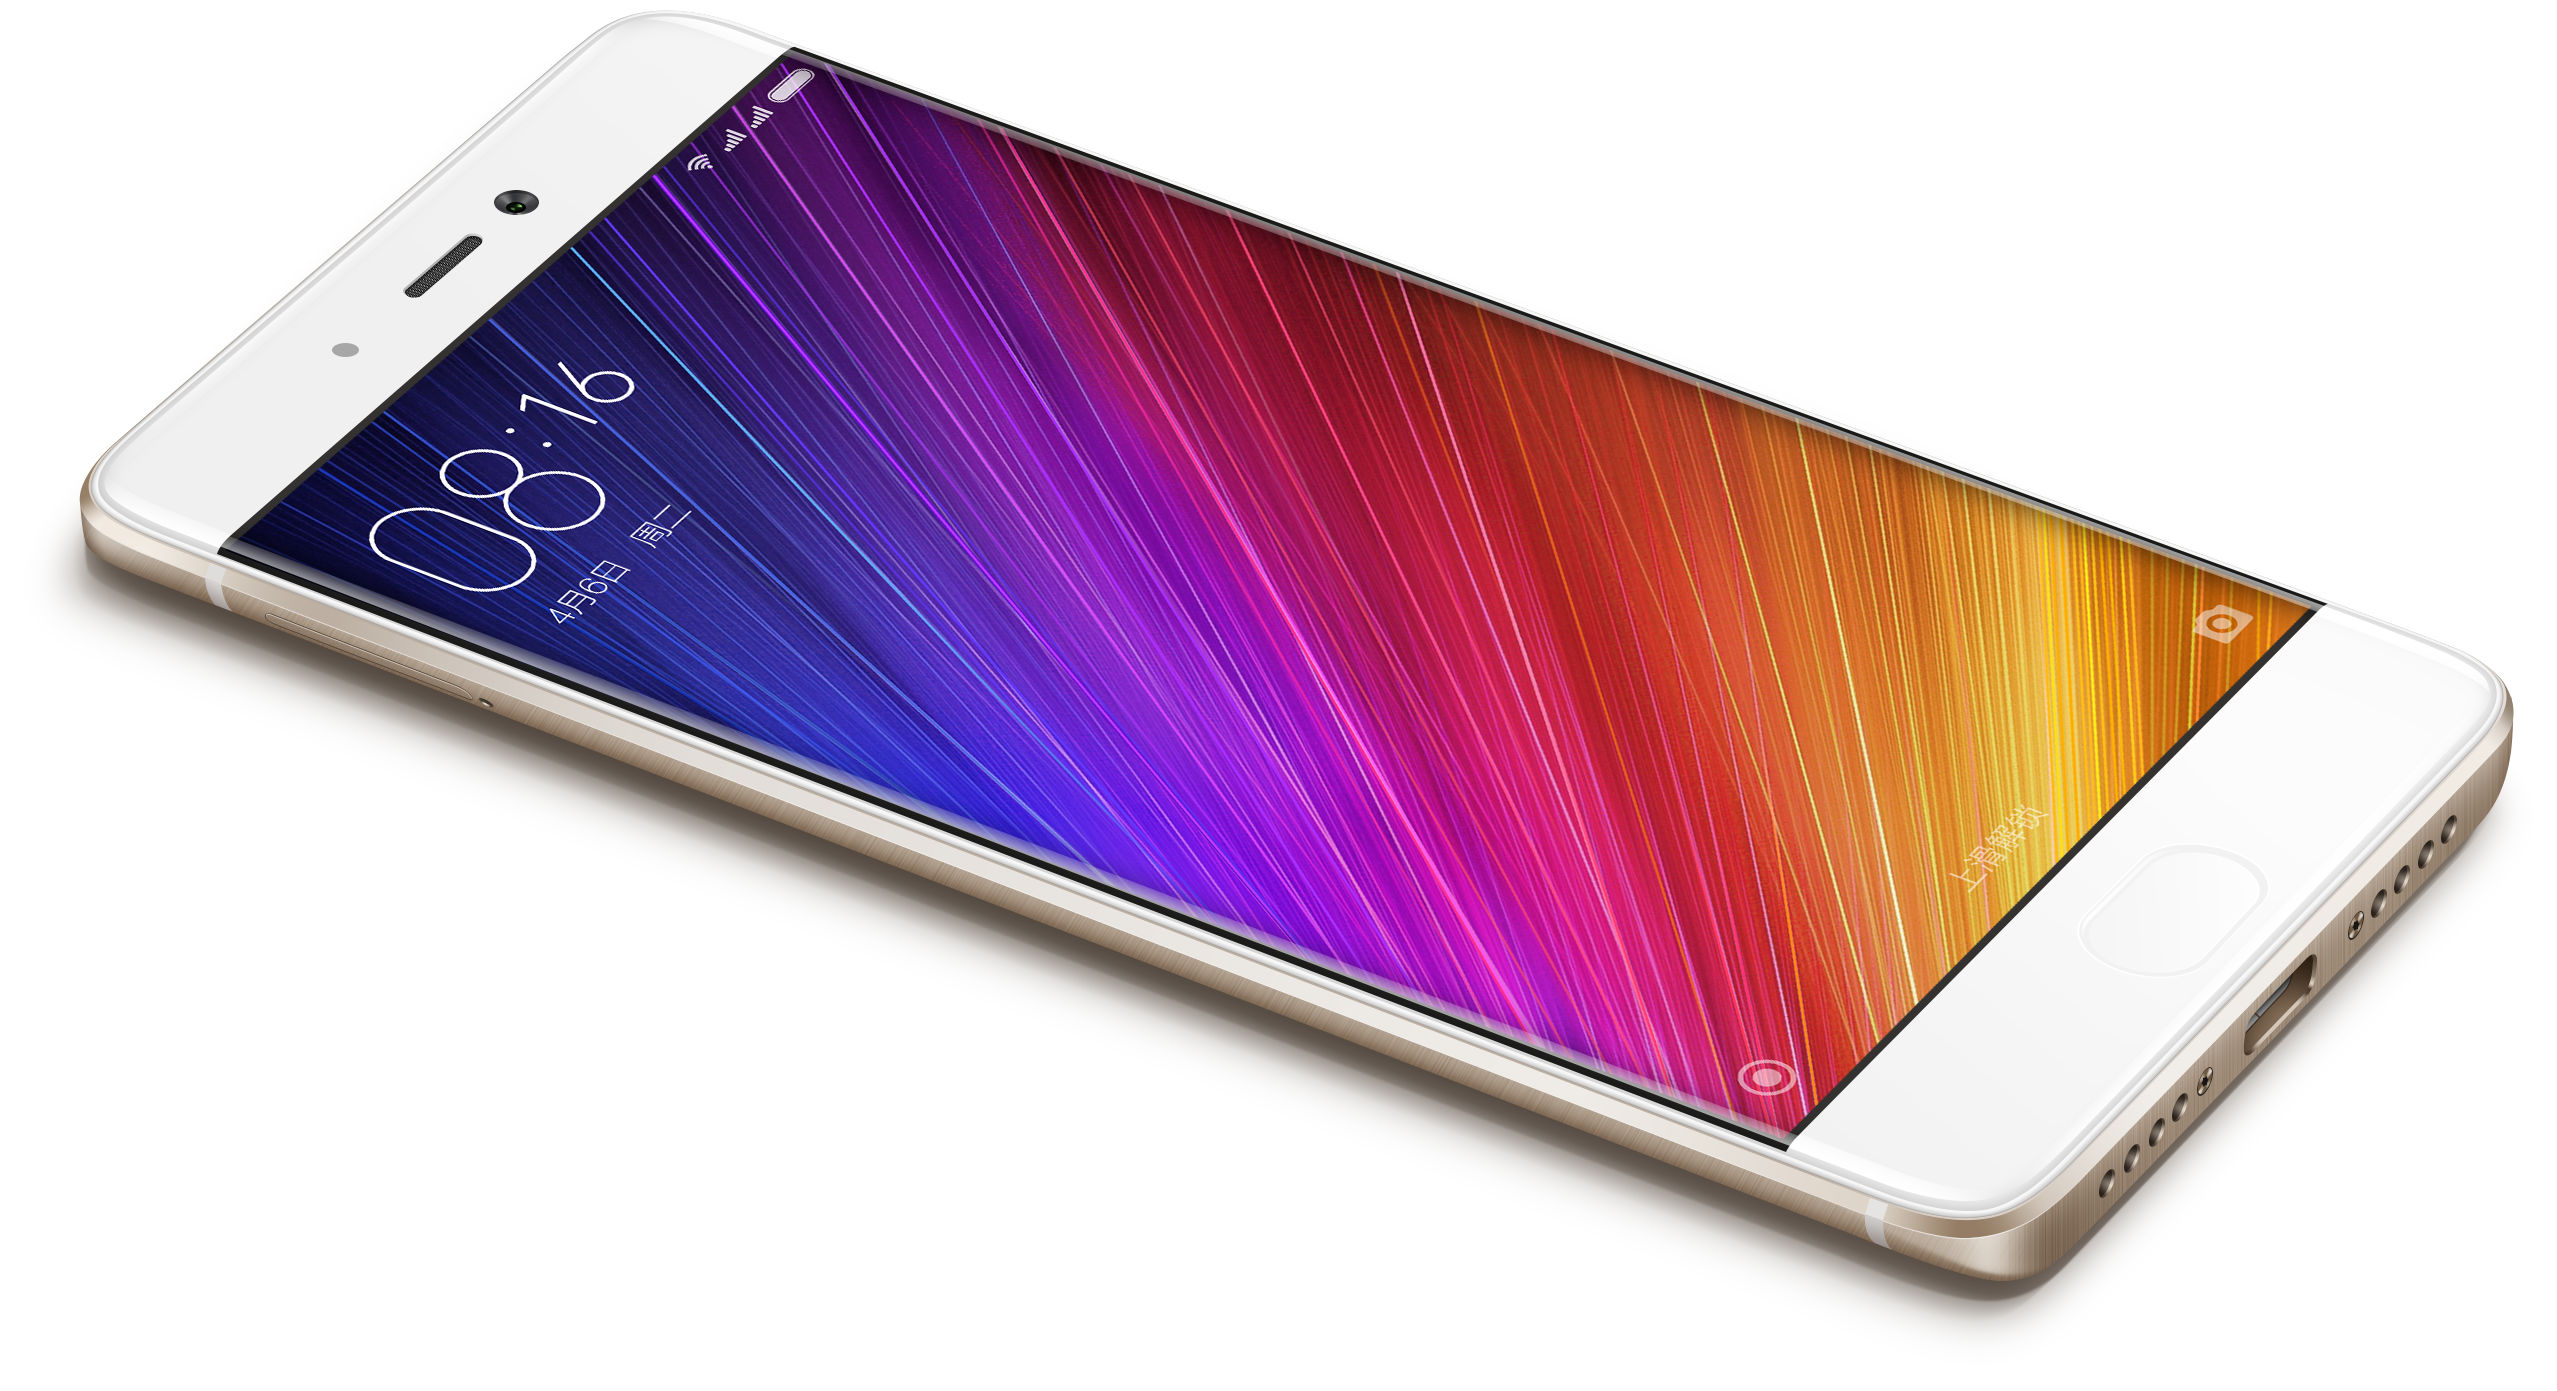 शिओमी 'एमआई ५एस' स्मार्टफाेन आउँदै, ४६ हजार रुपैंयामै प्रि-बुकिंग